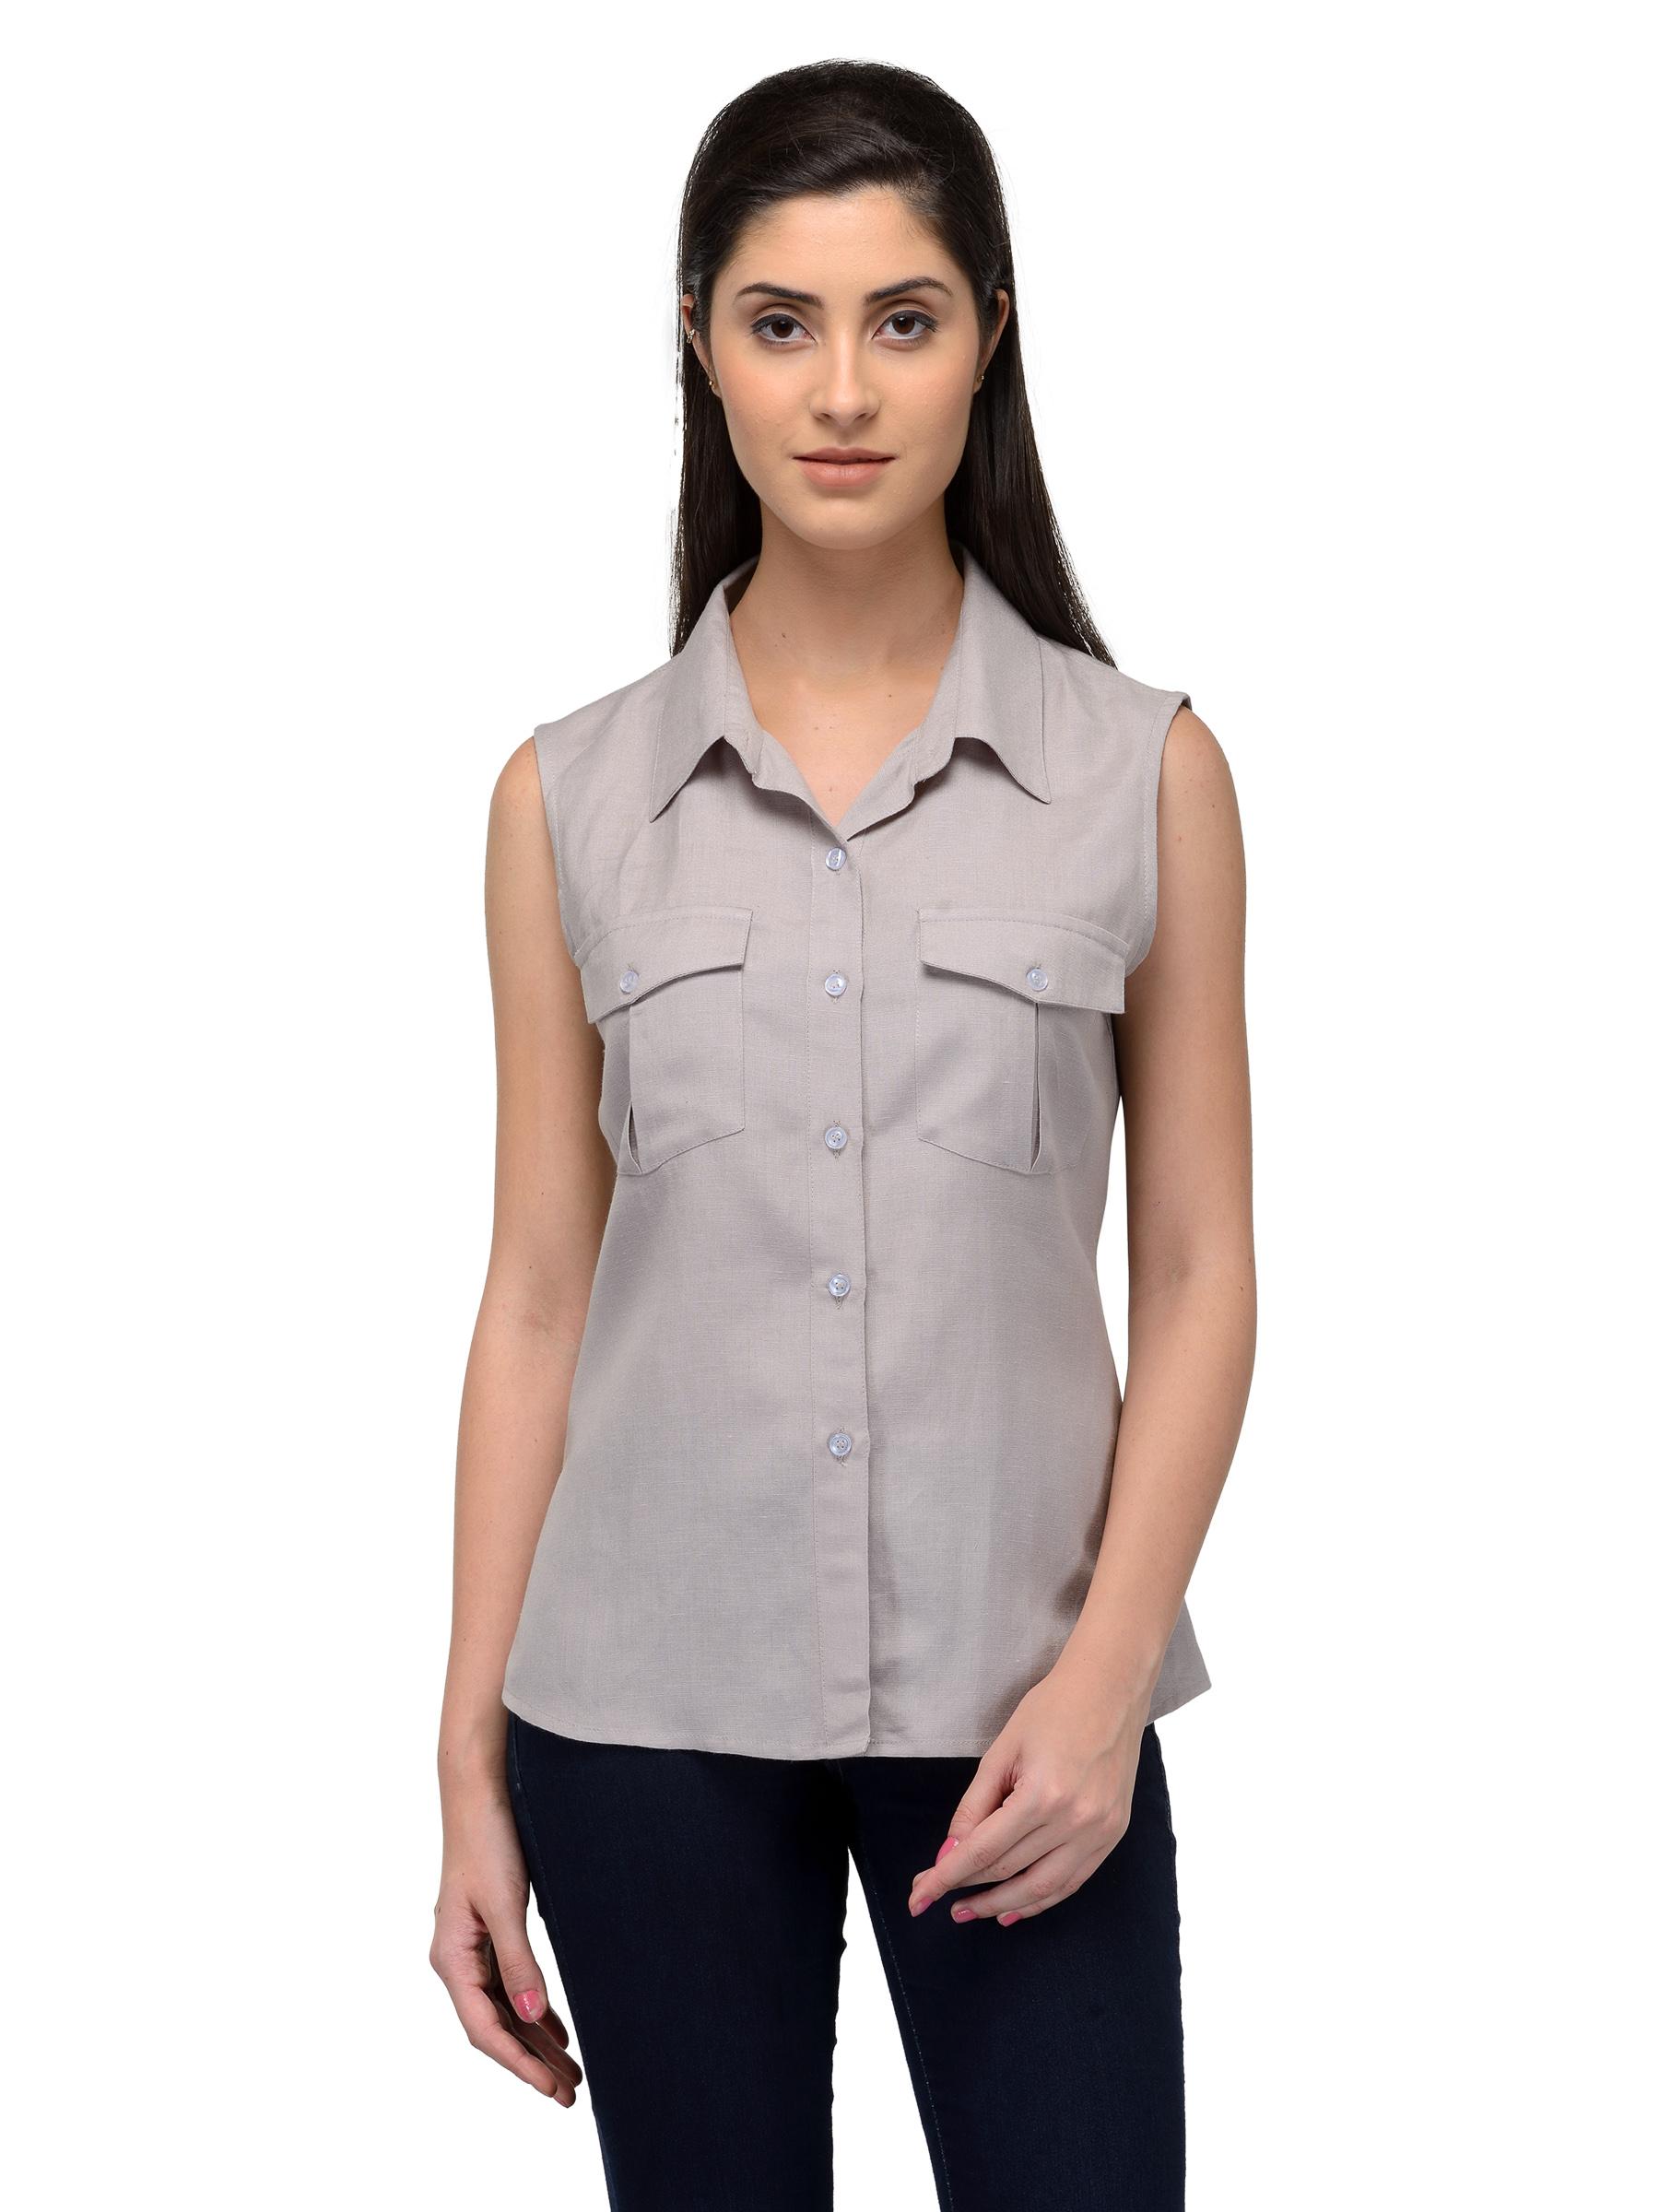 Patrorna Women S Viscose Shirt (Grey F06Vf0000A024Gs) d2a9b945a